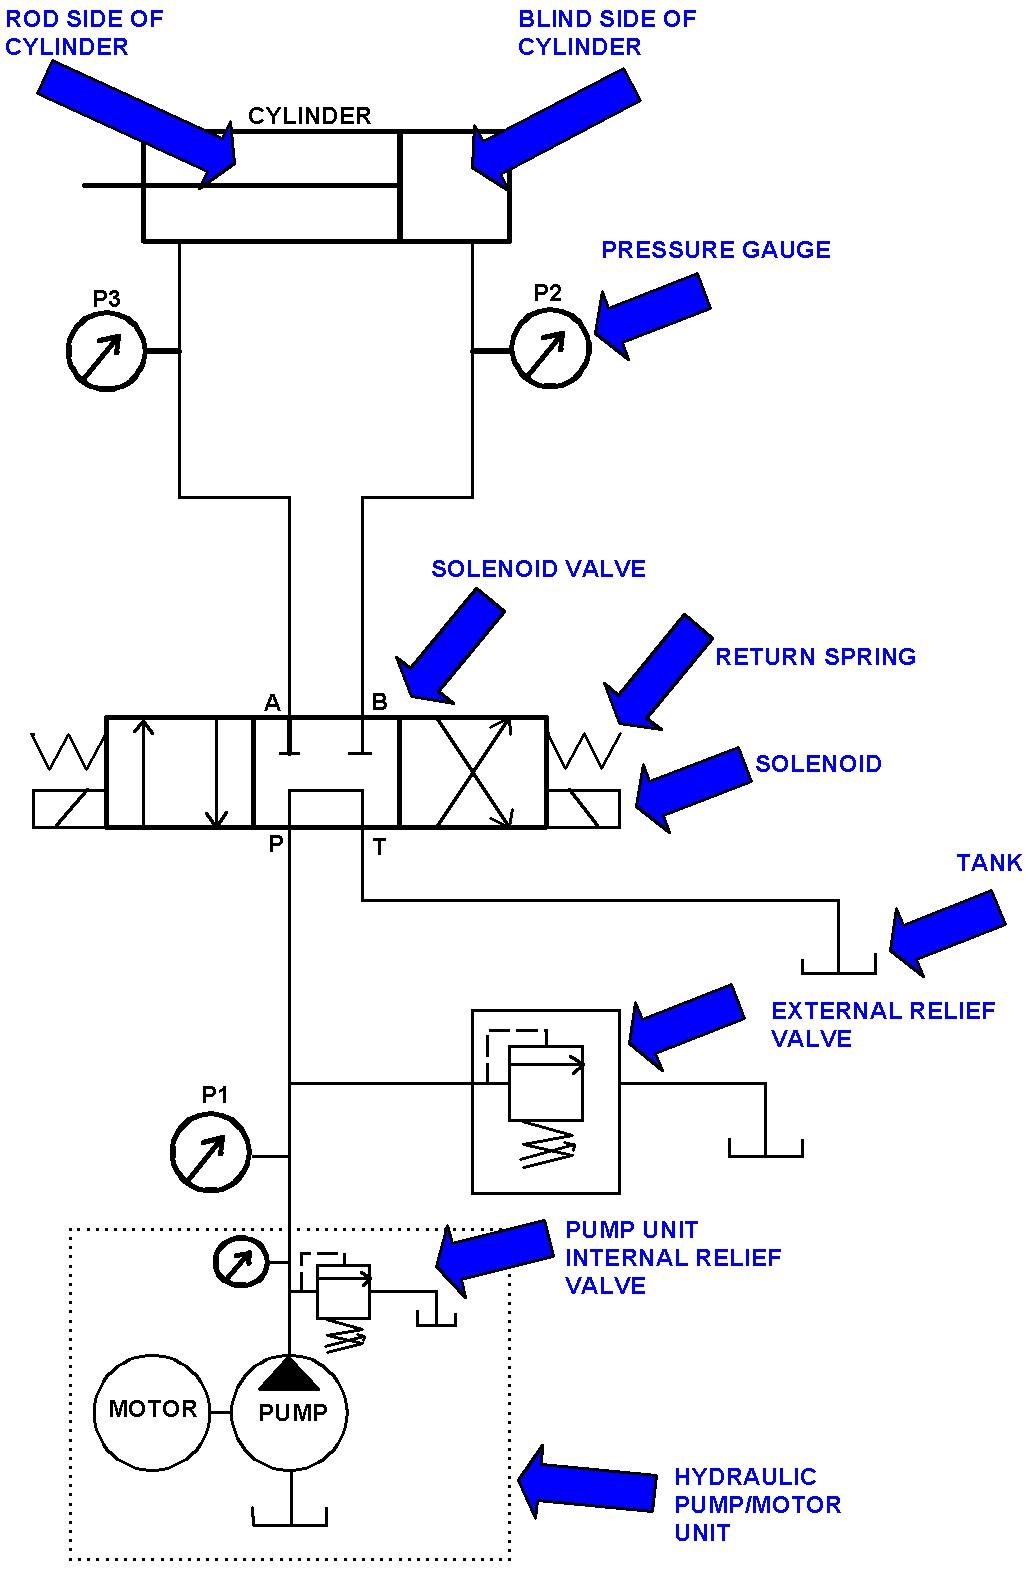 pnuematics symbols CNC Repair and Troubleshooting